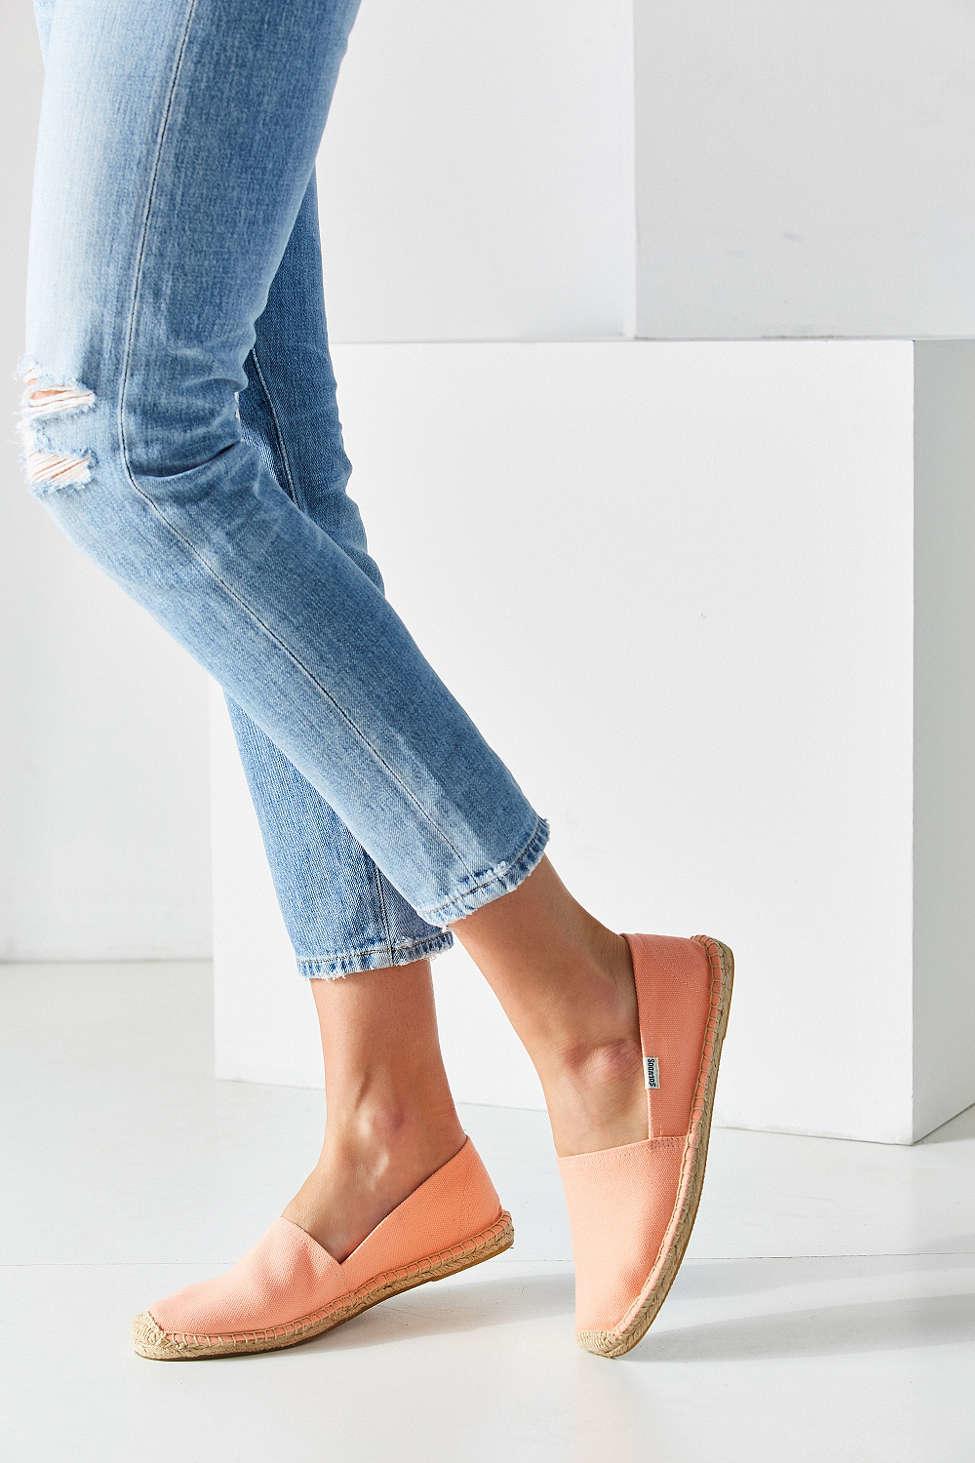 ed7f63eb0e3 Soludos Pink Dali Espadrille Slip-on Shoe